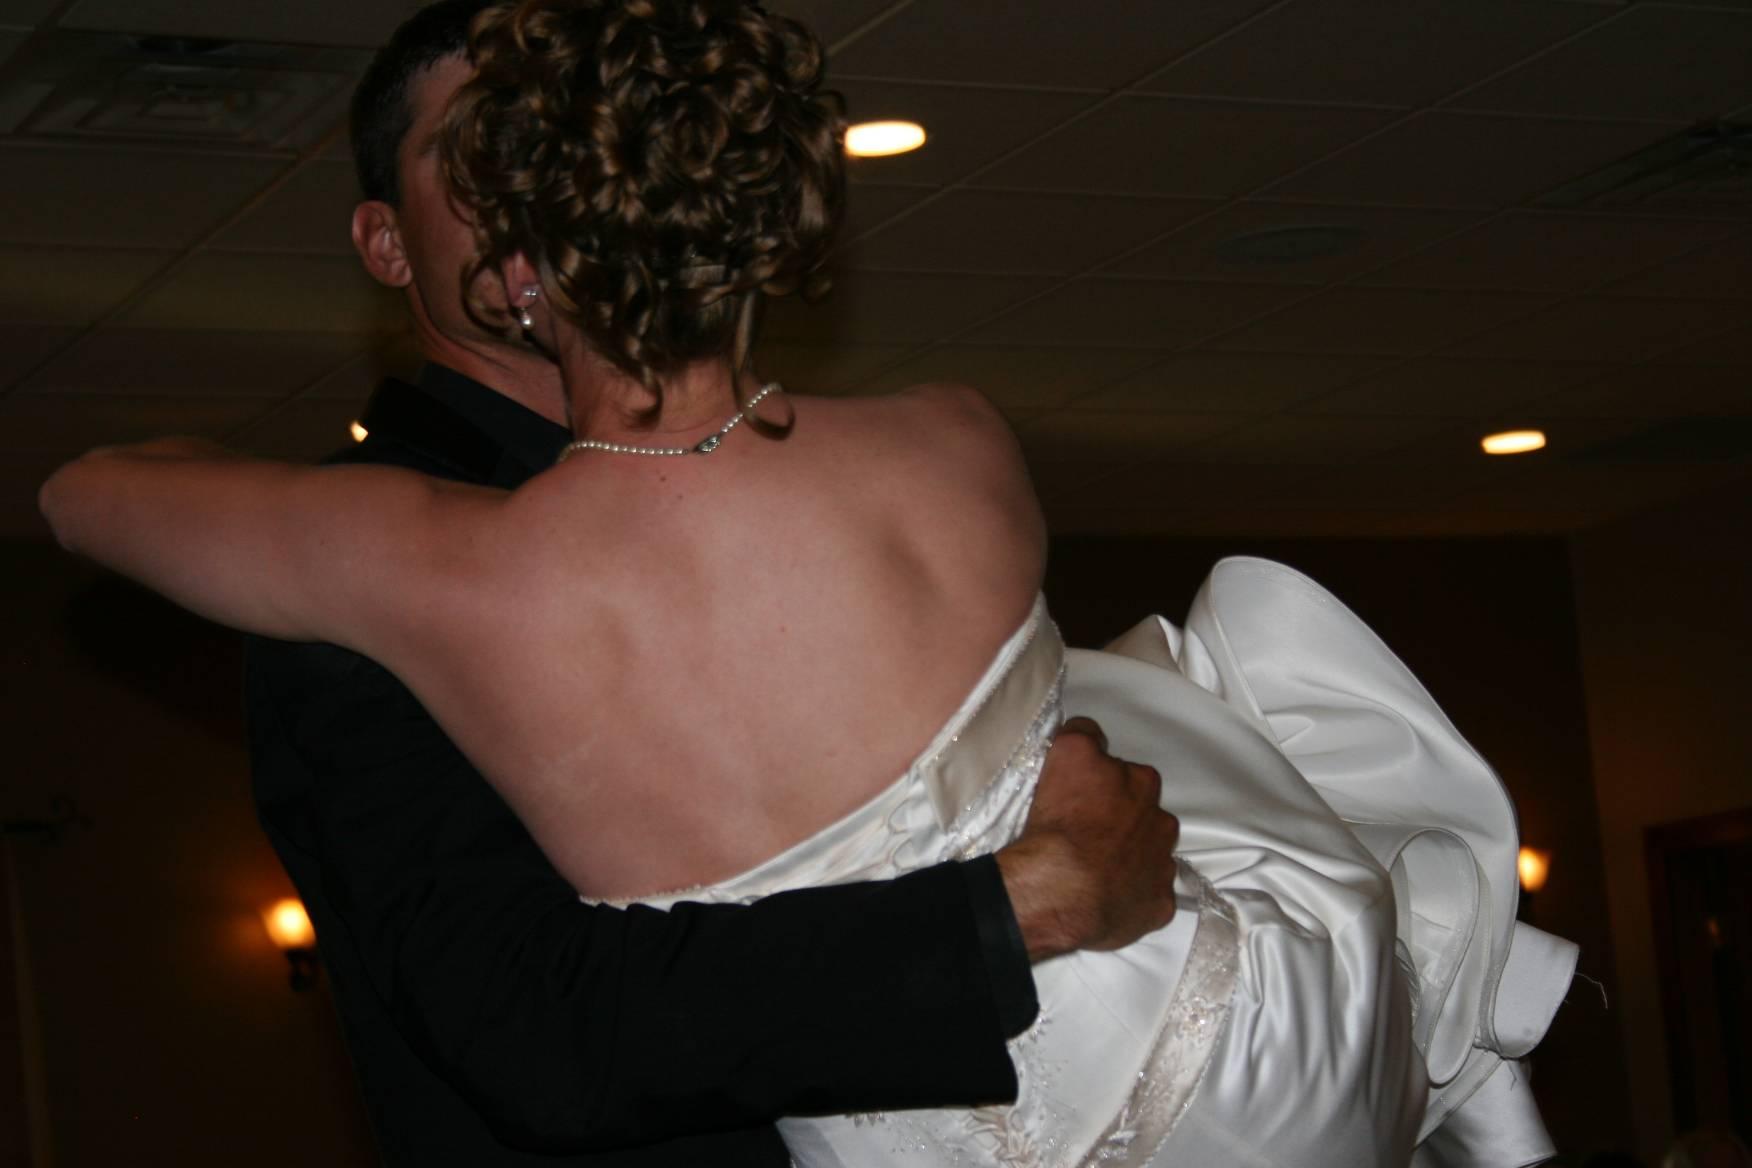 Corey carries his bride into the wedding reception.